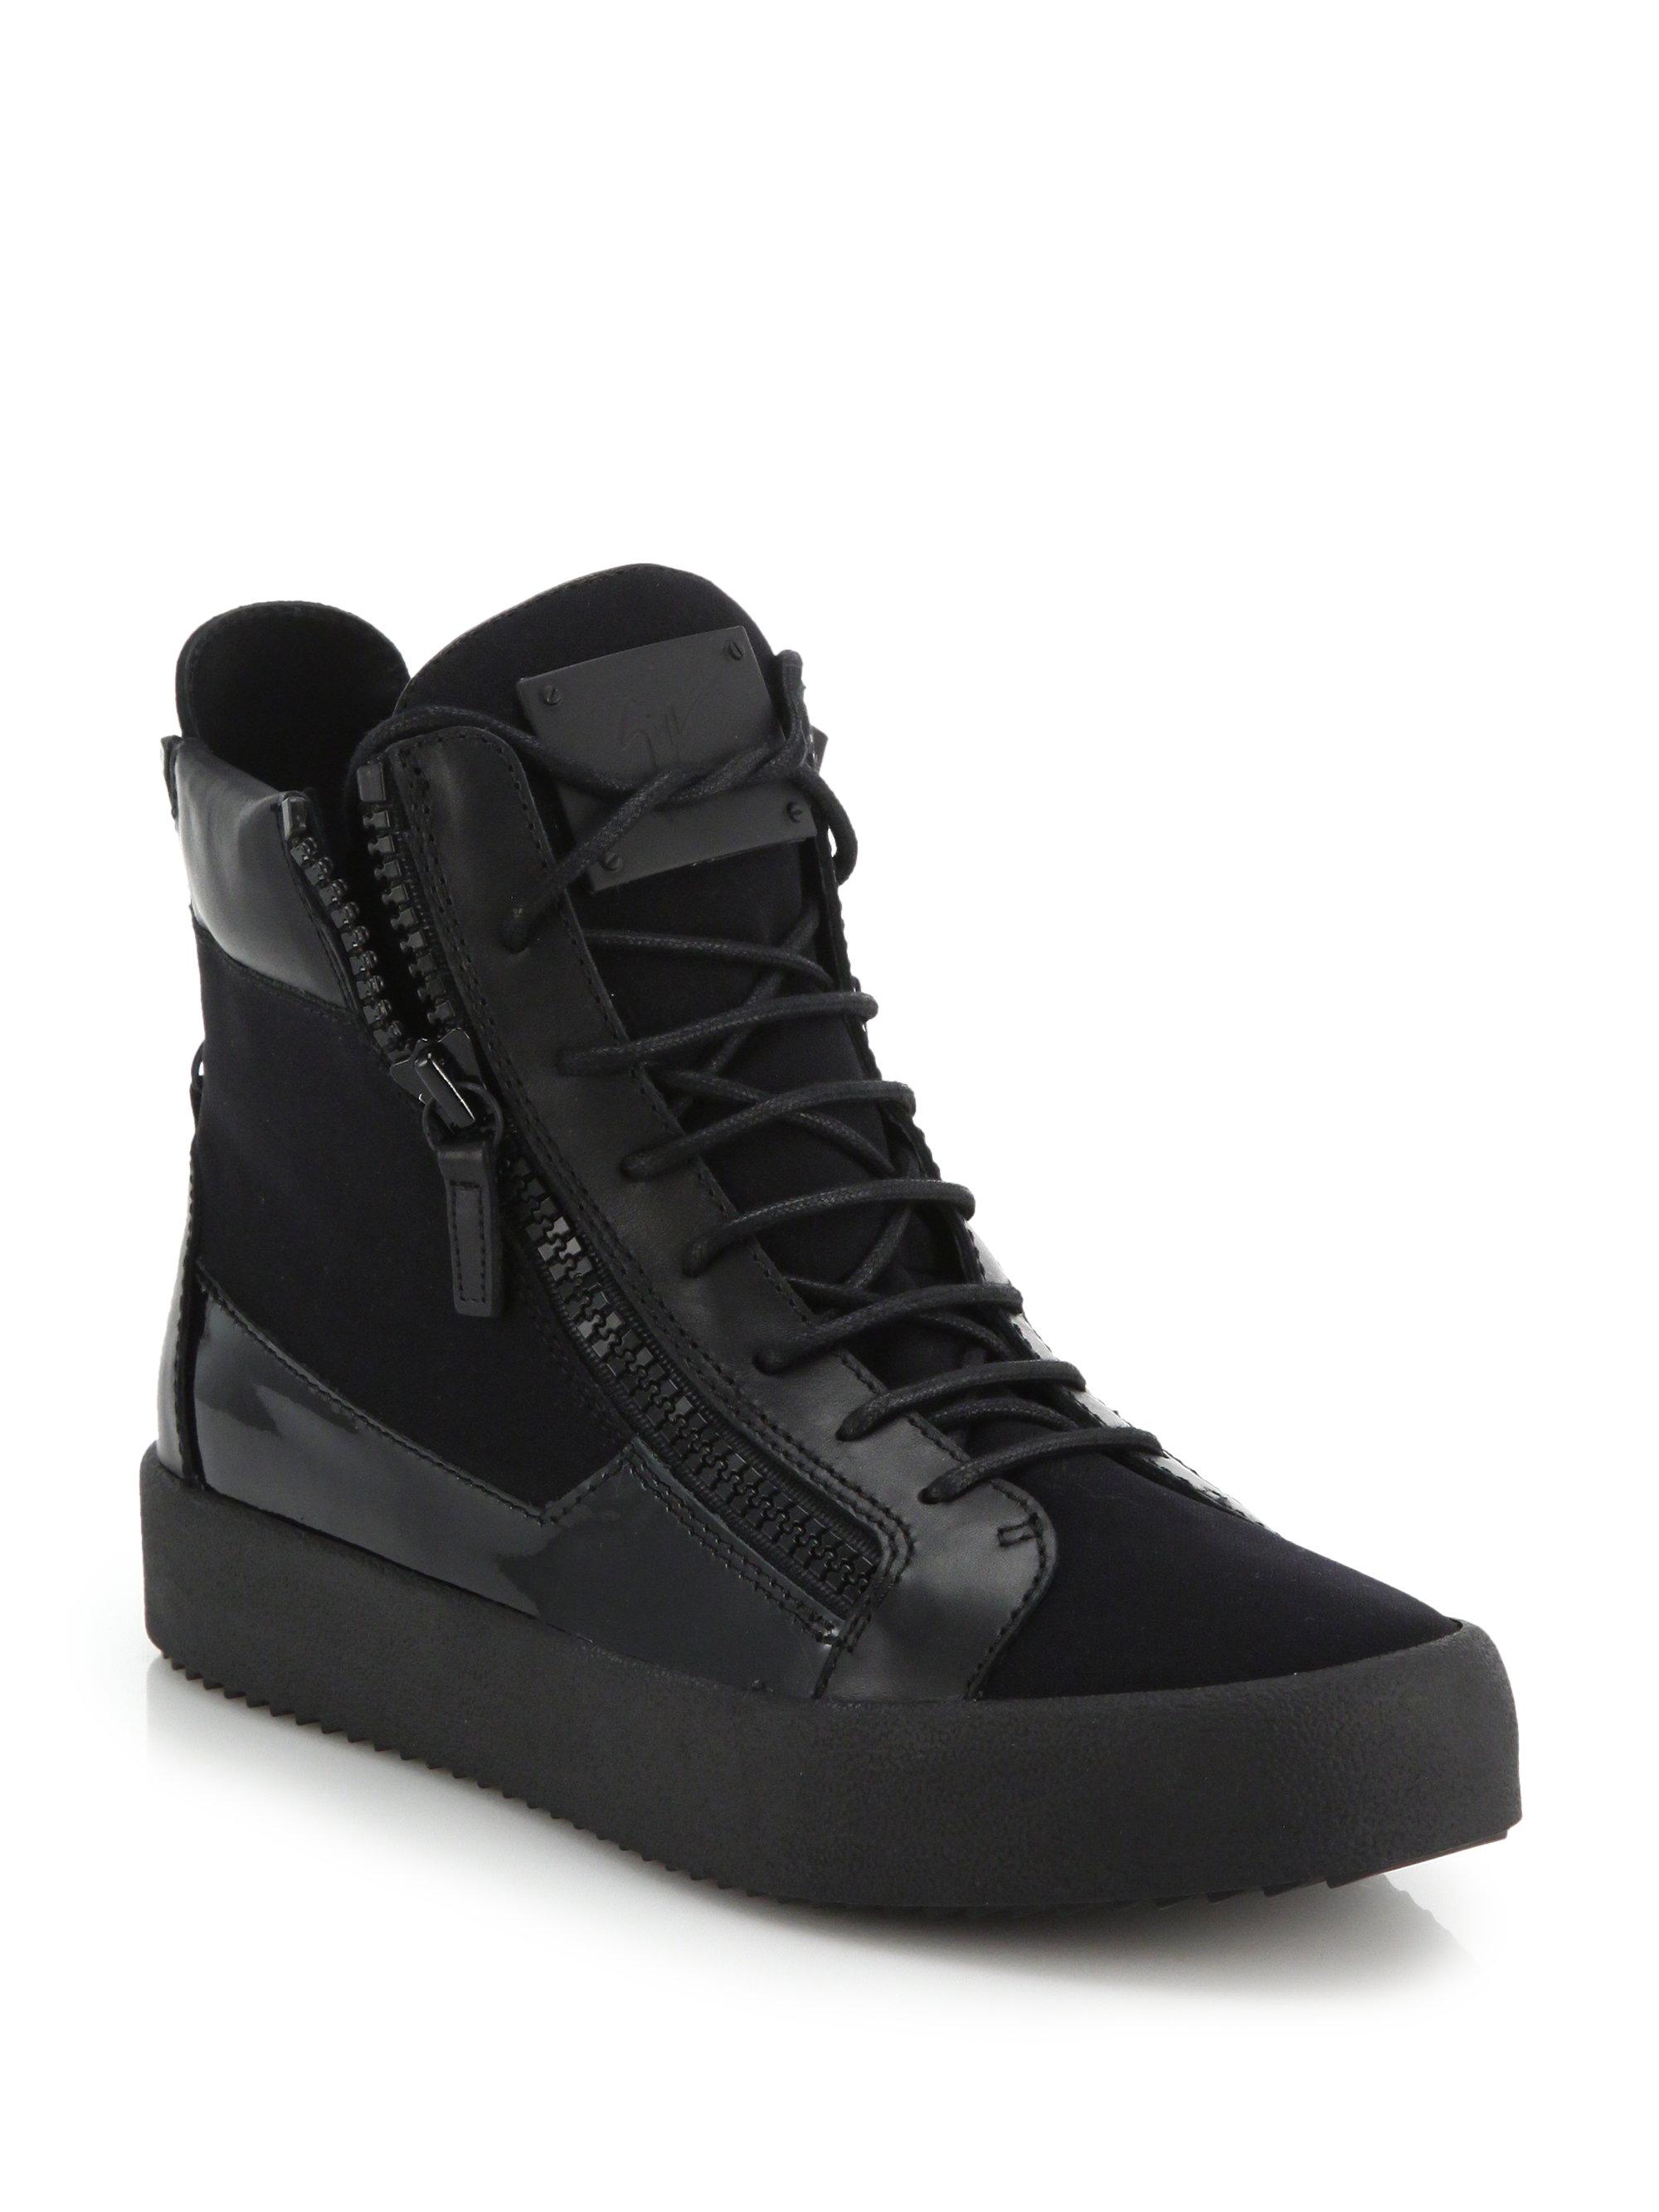 Armani Mens Shoes Australia